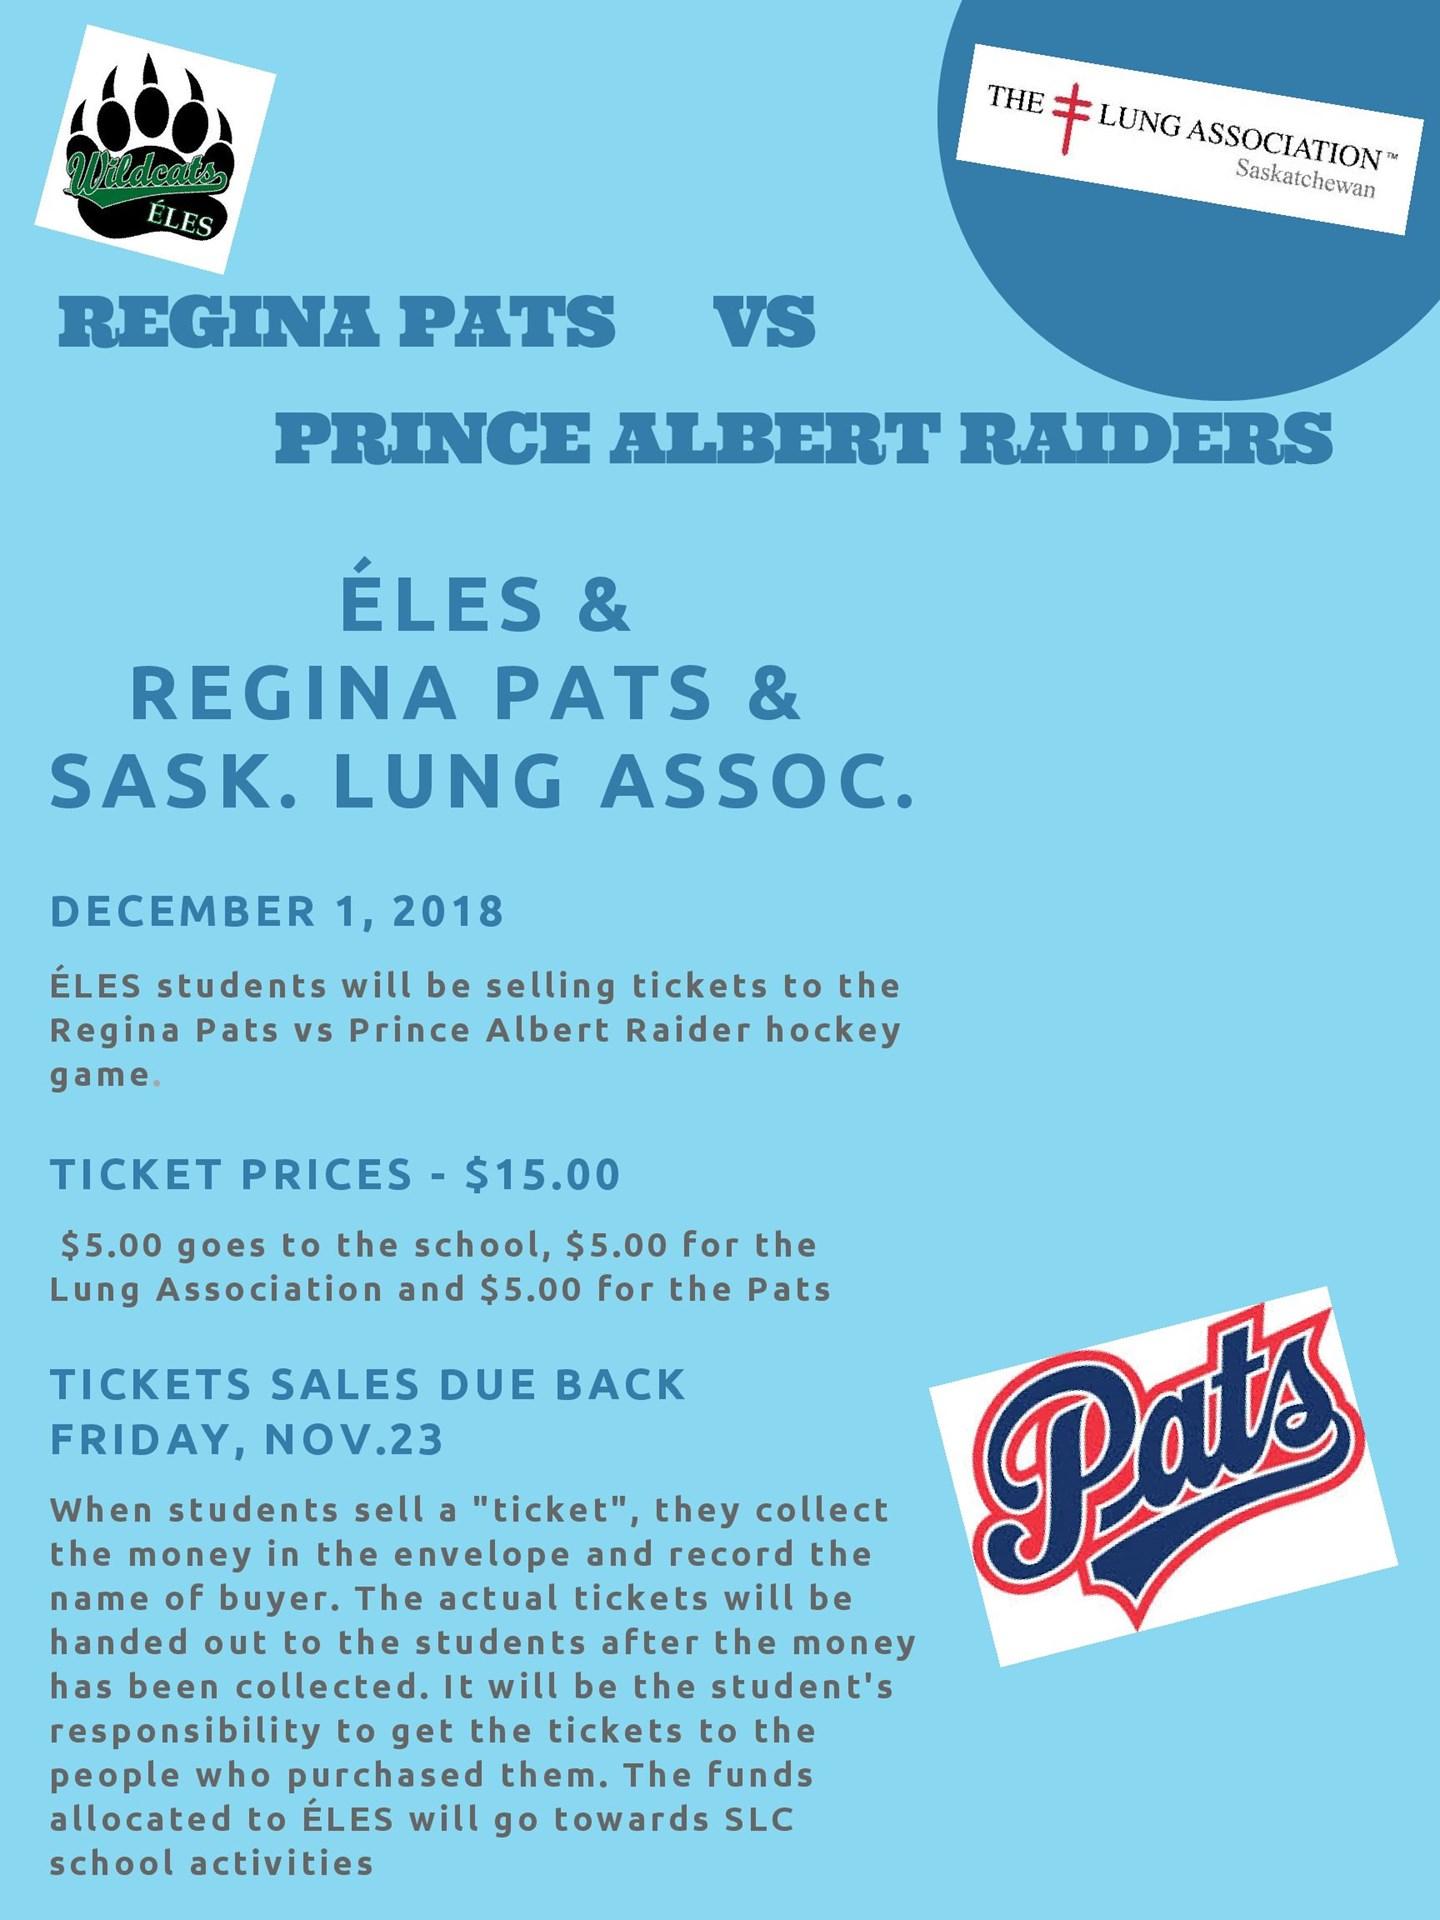 ELES, Lung Assoc and Regina Pats Poster.jpg